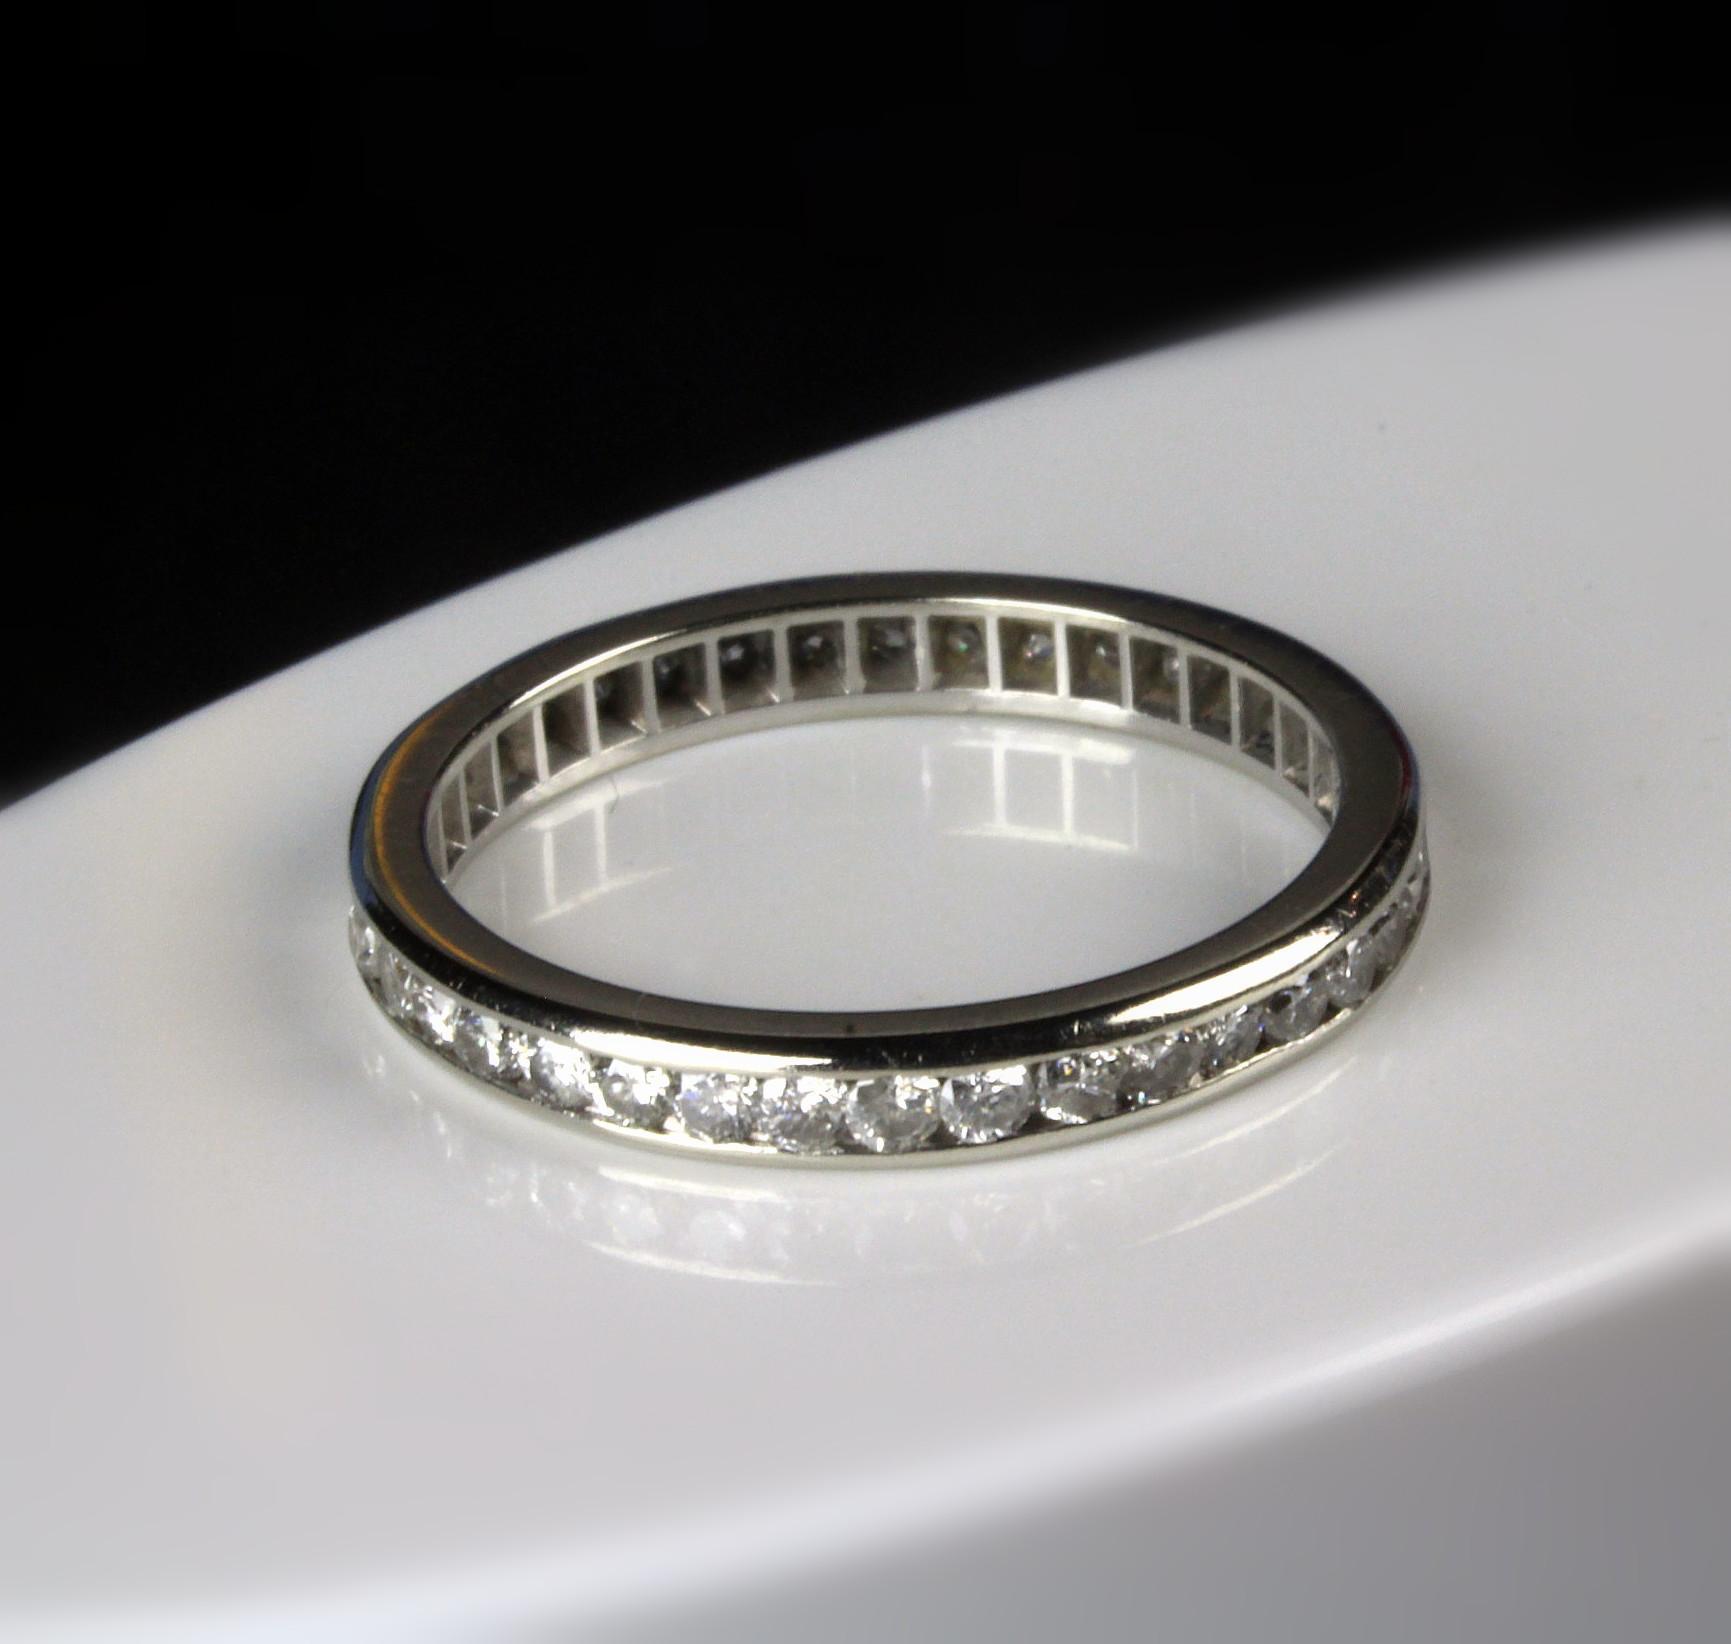 14K Eternity Band 1.0 Carat Diamond